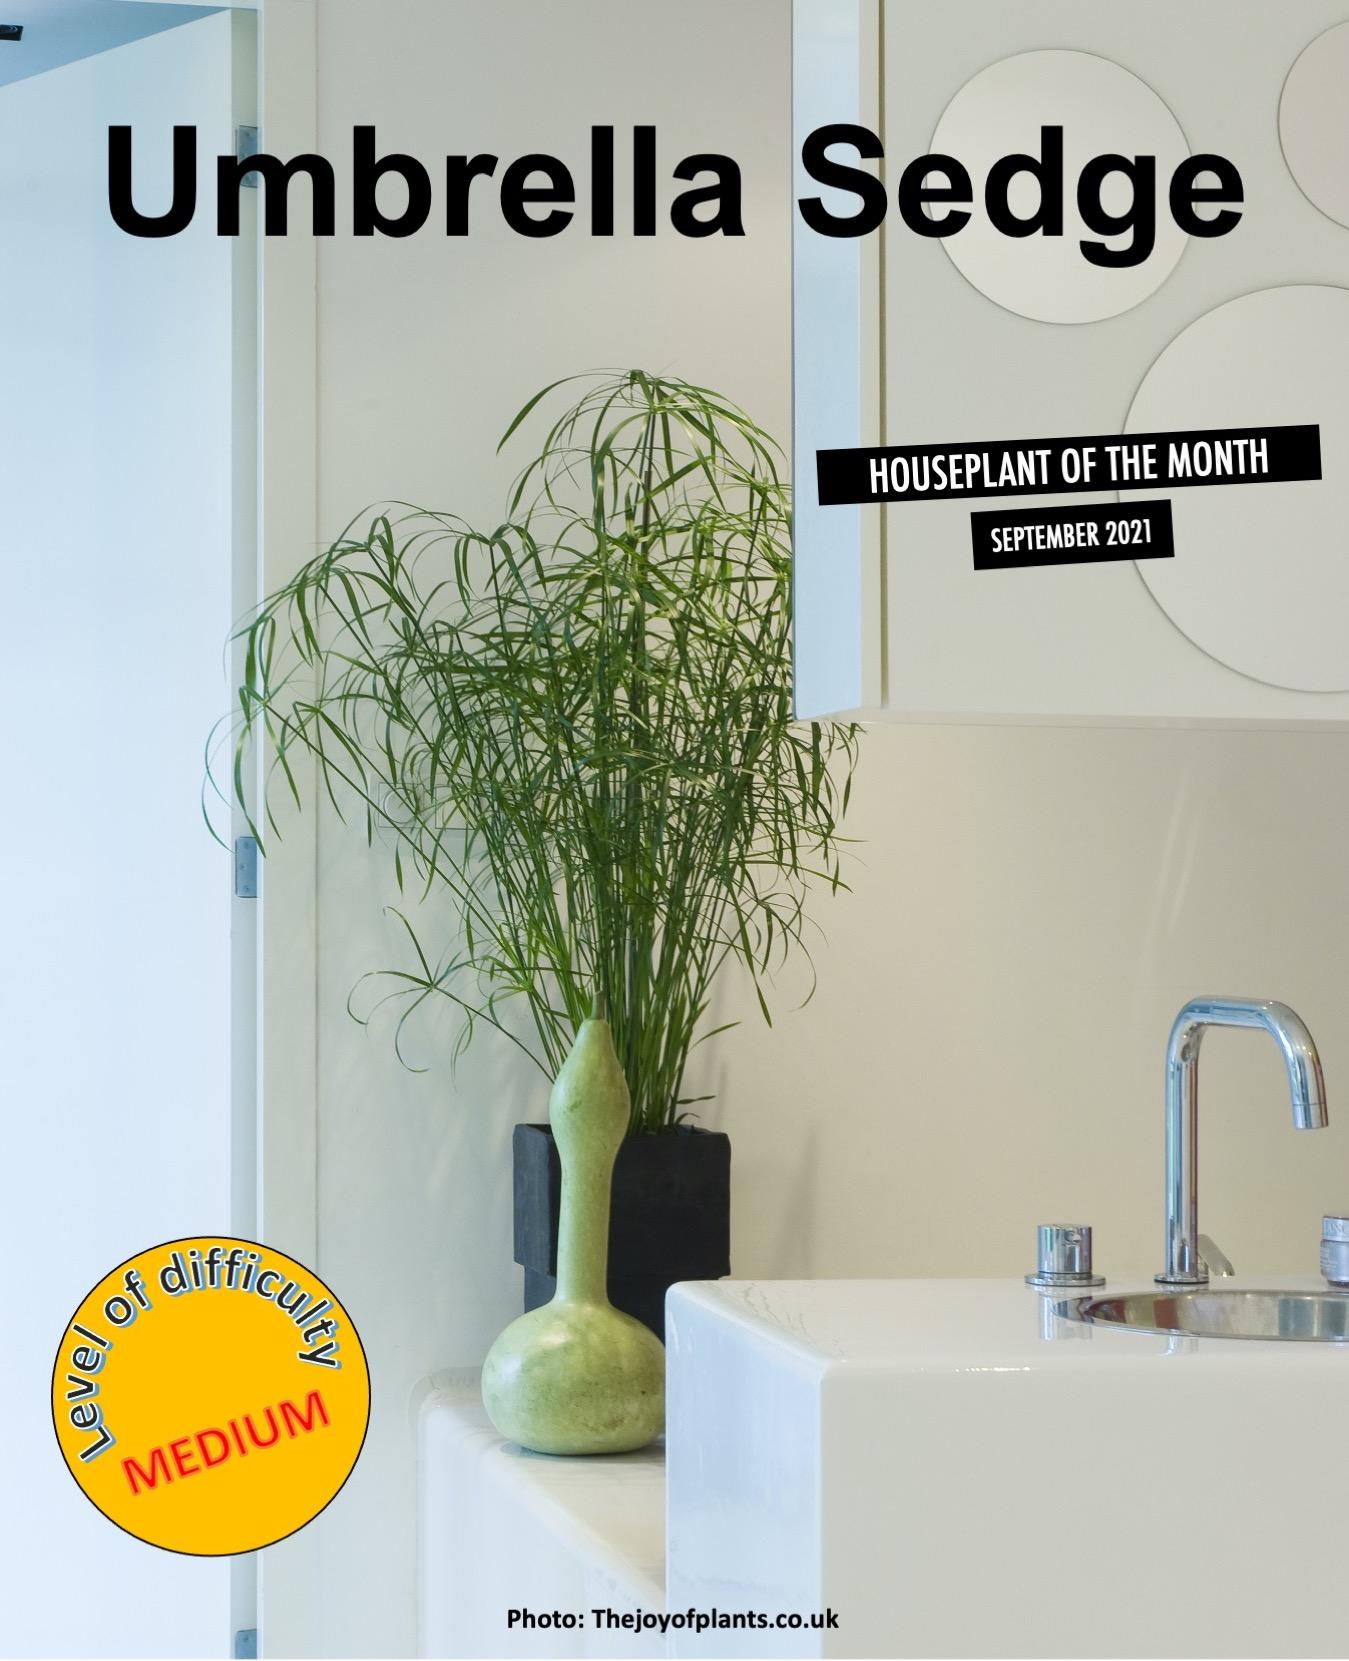 Umbrella sedge in white decor